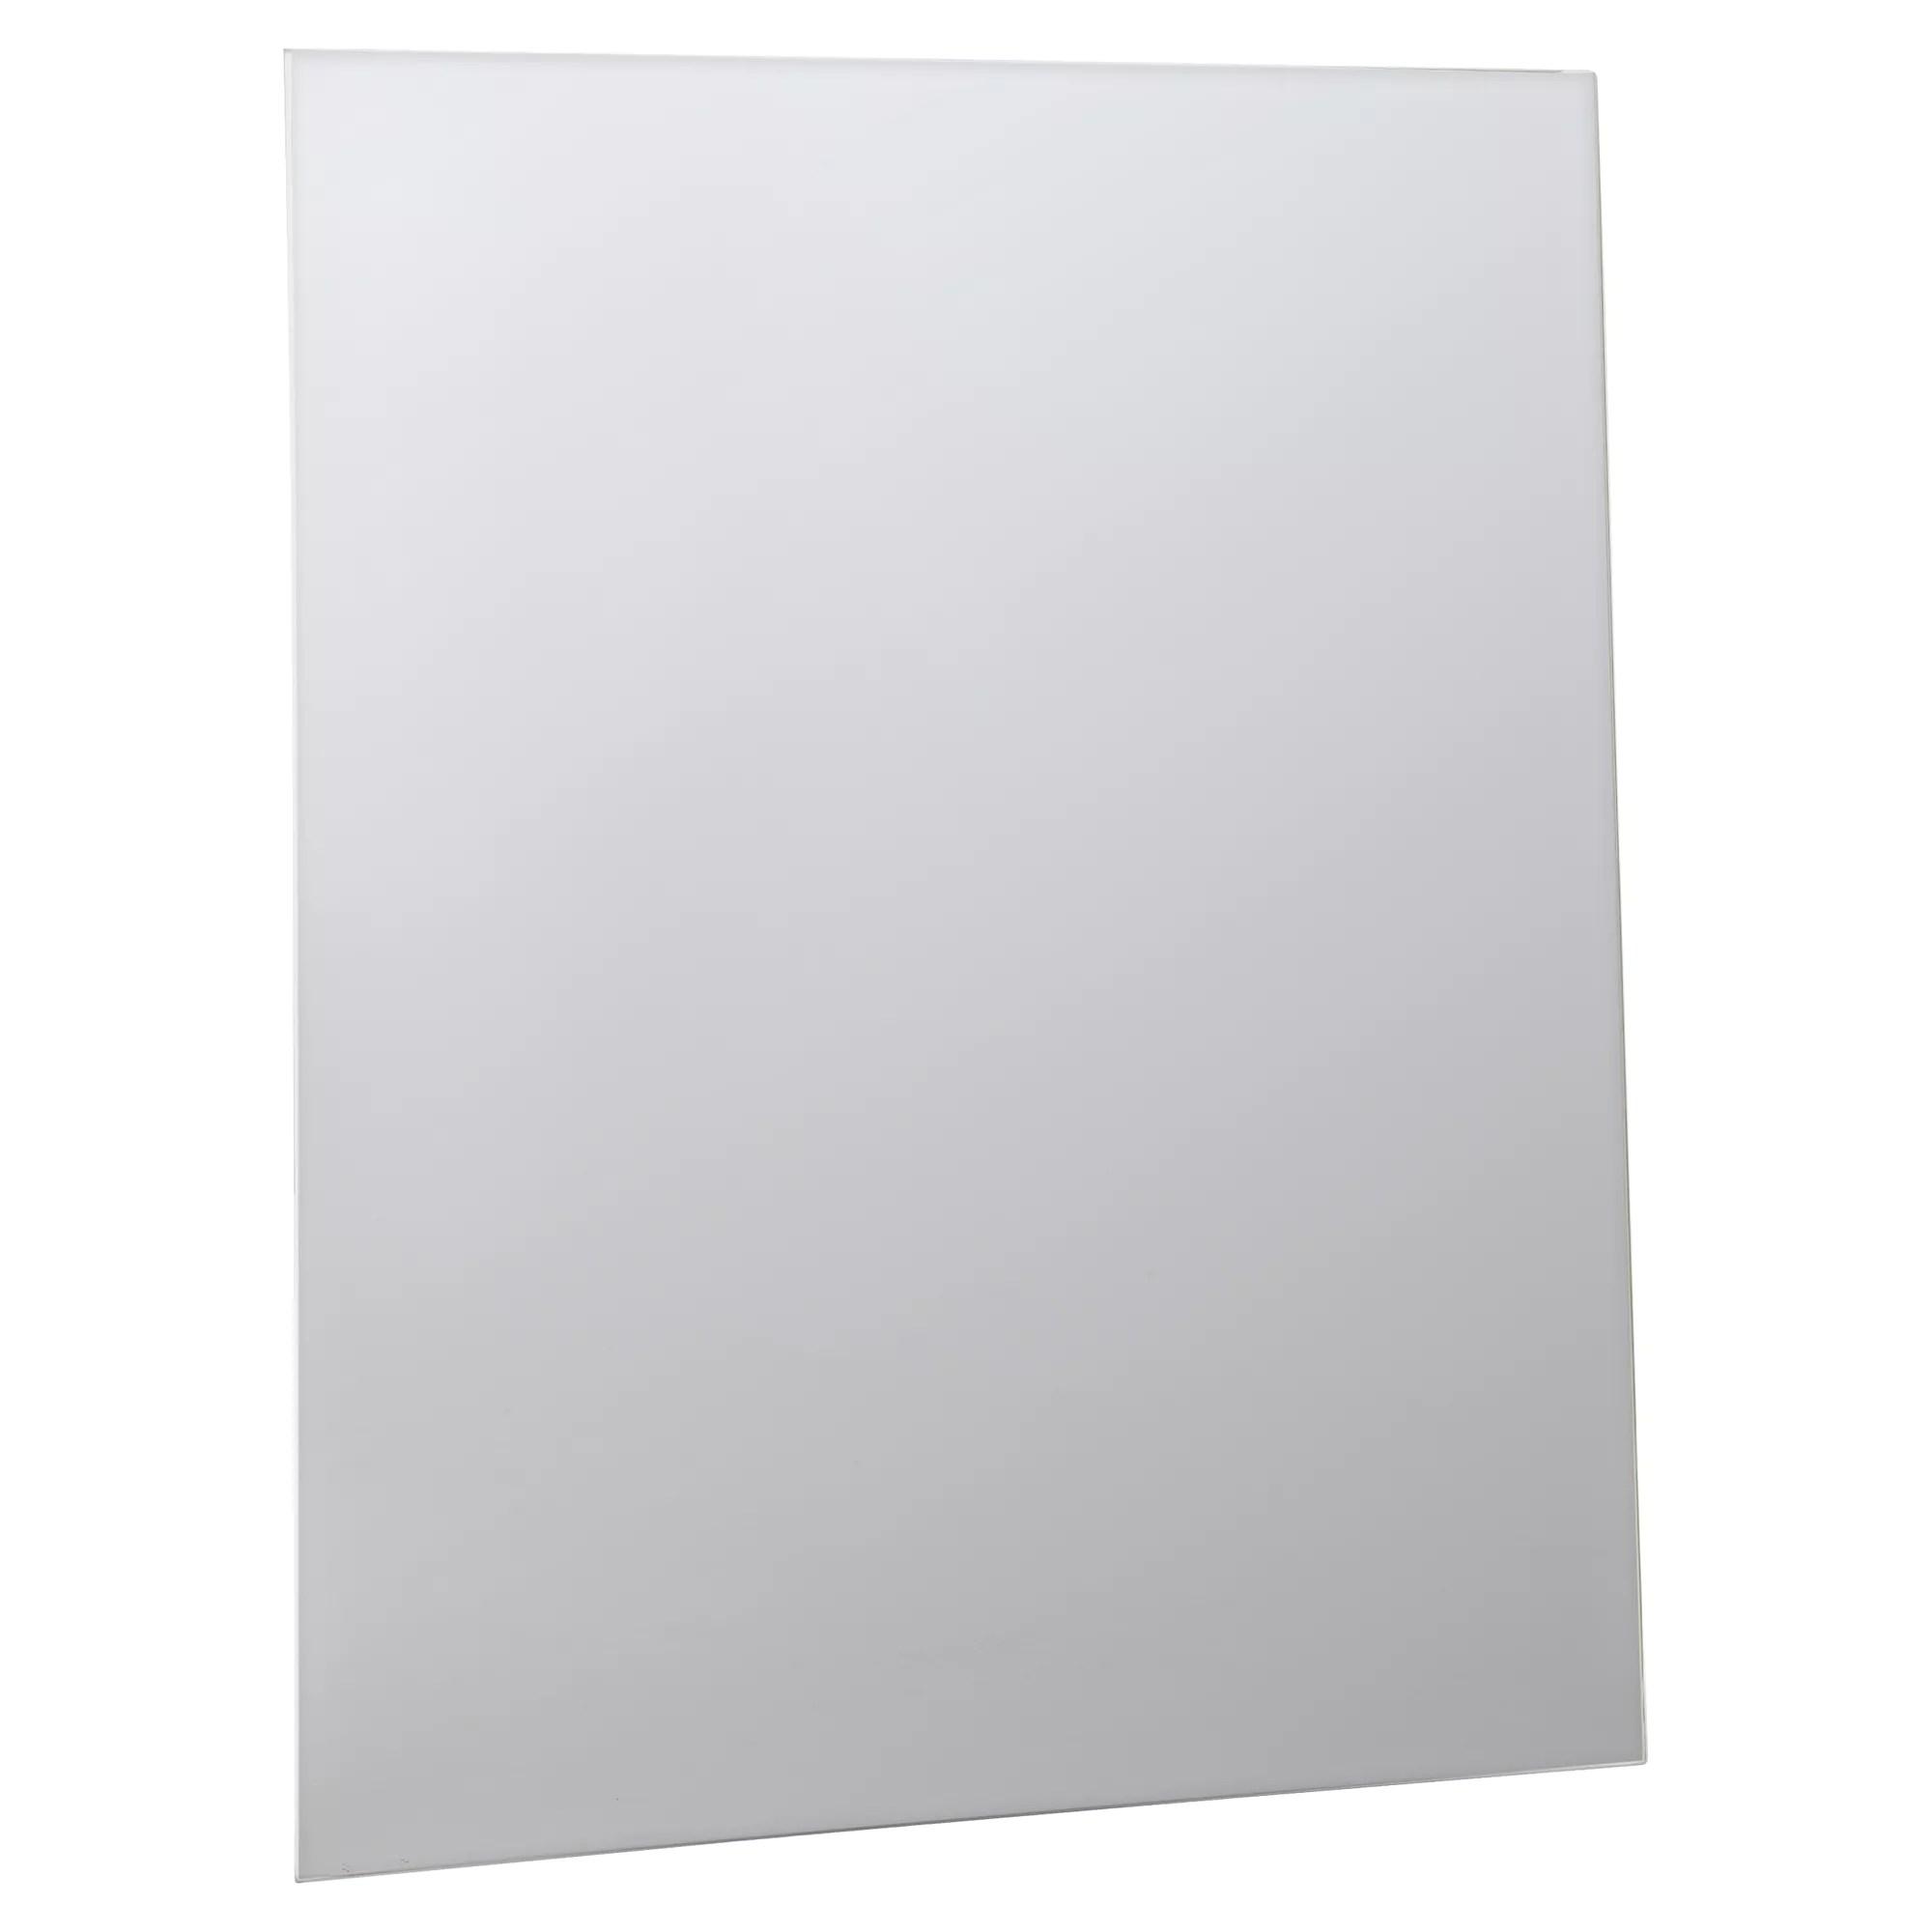 Kristall Form Spiegel Jump 40 X 50 ǀ Toom Baumarkt